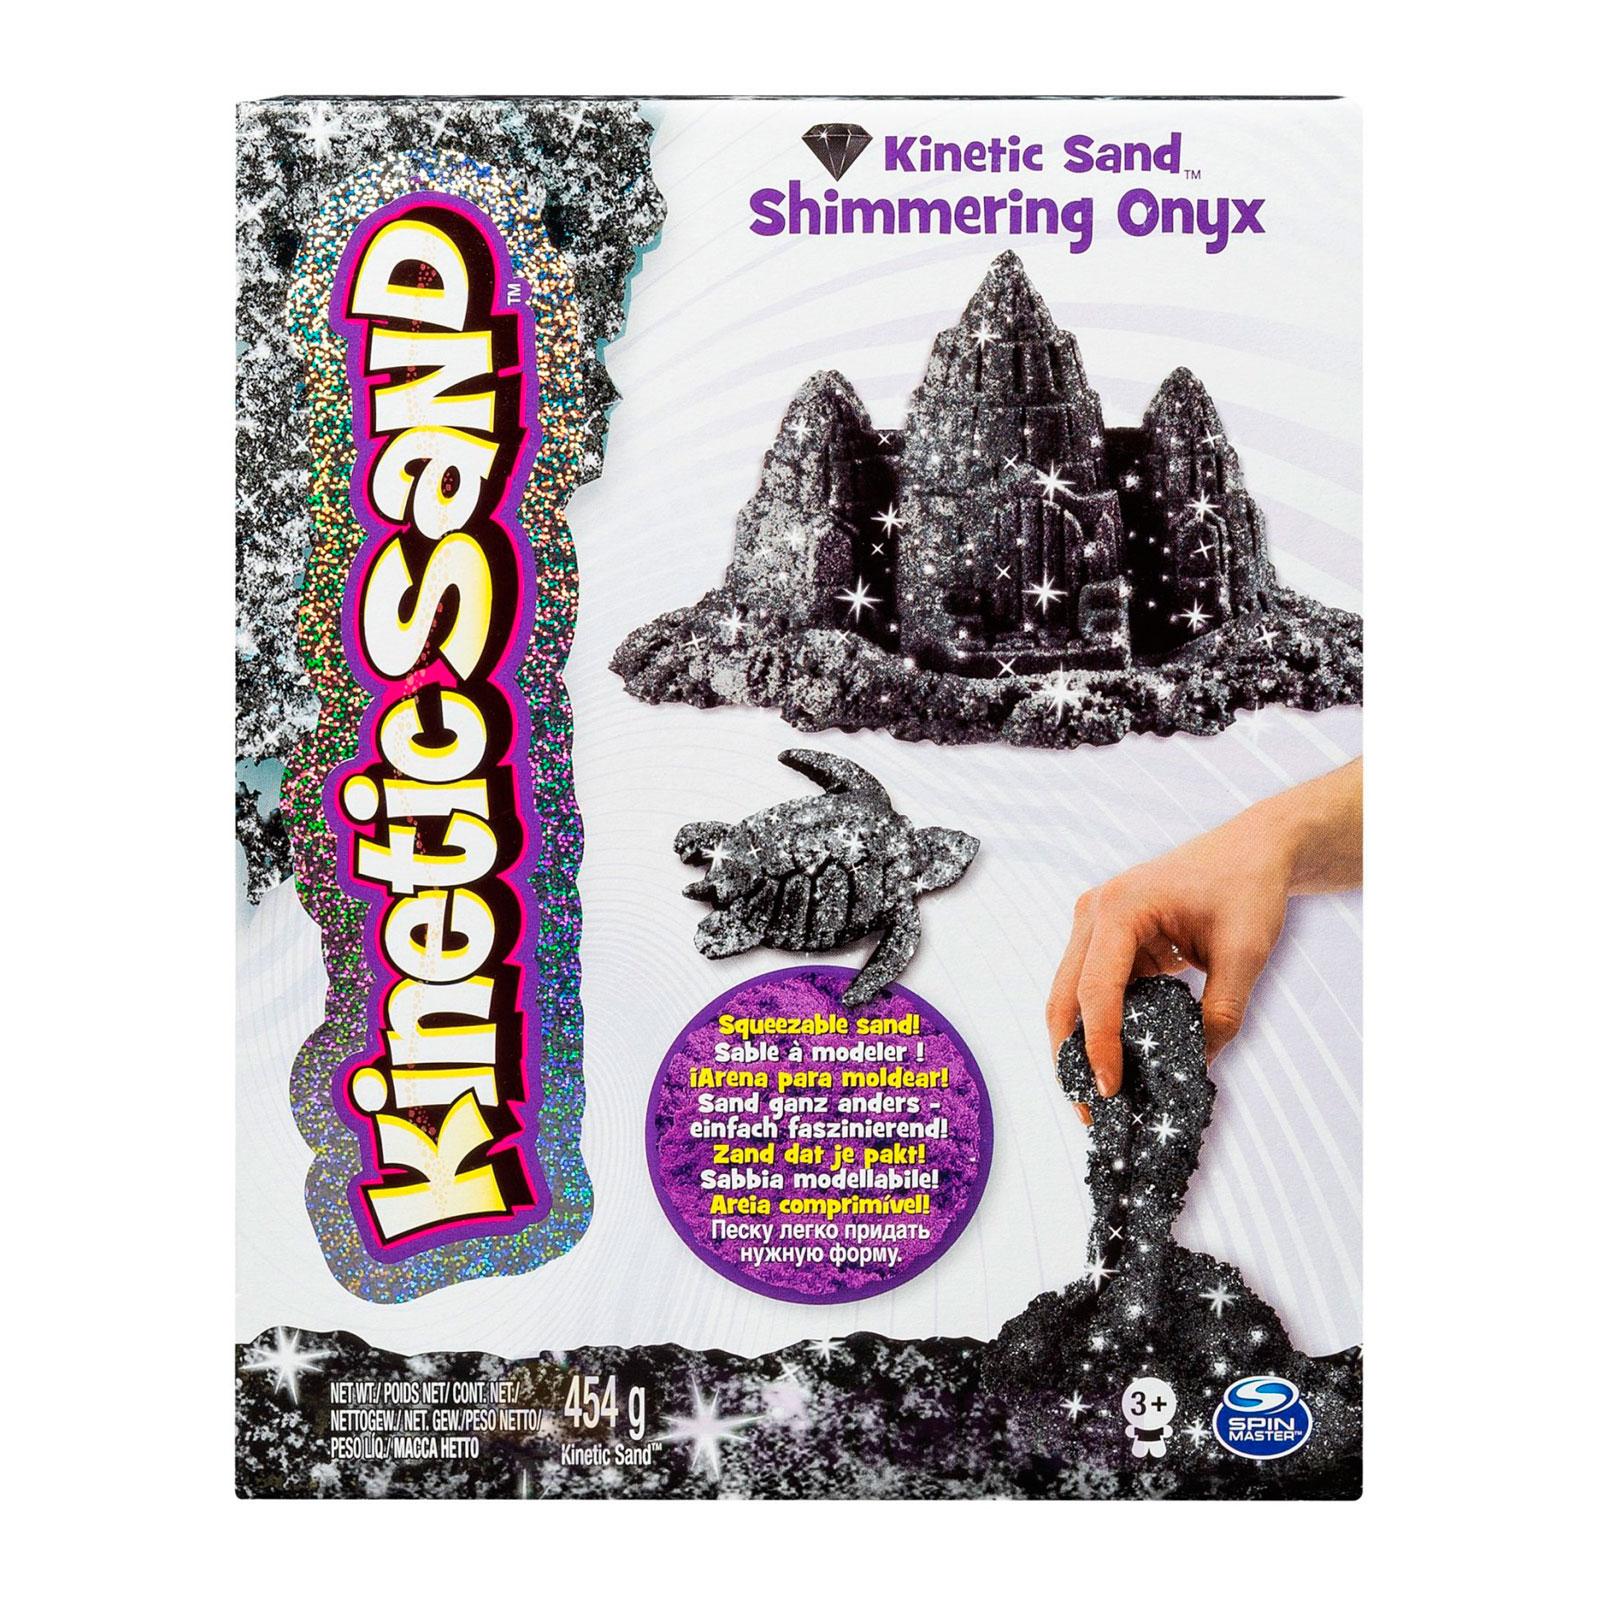 ������������ ����� Kinetic sand �����